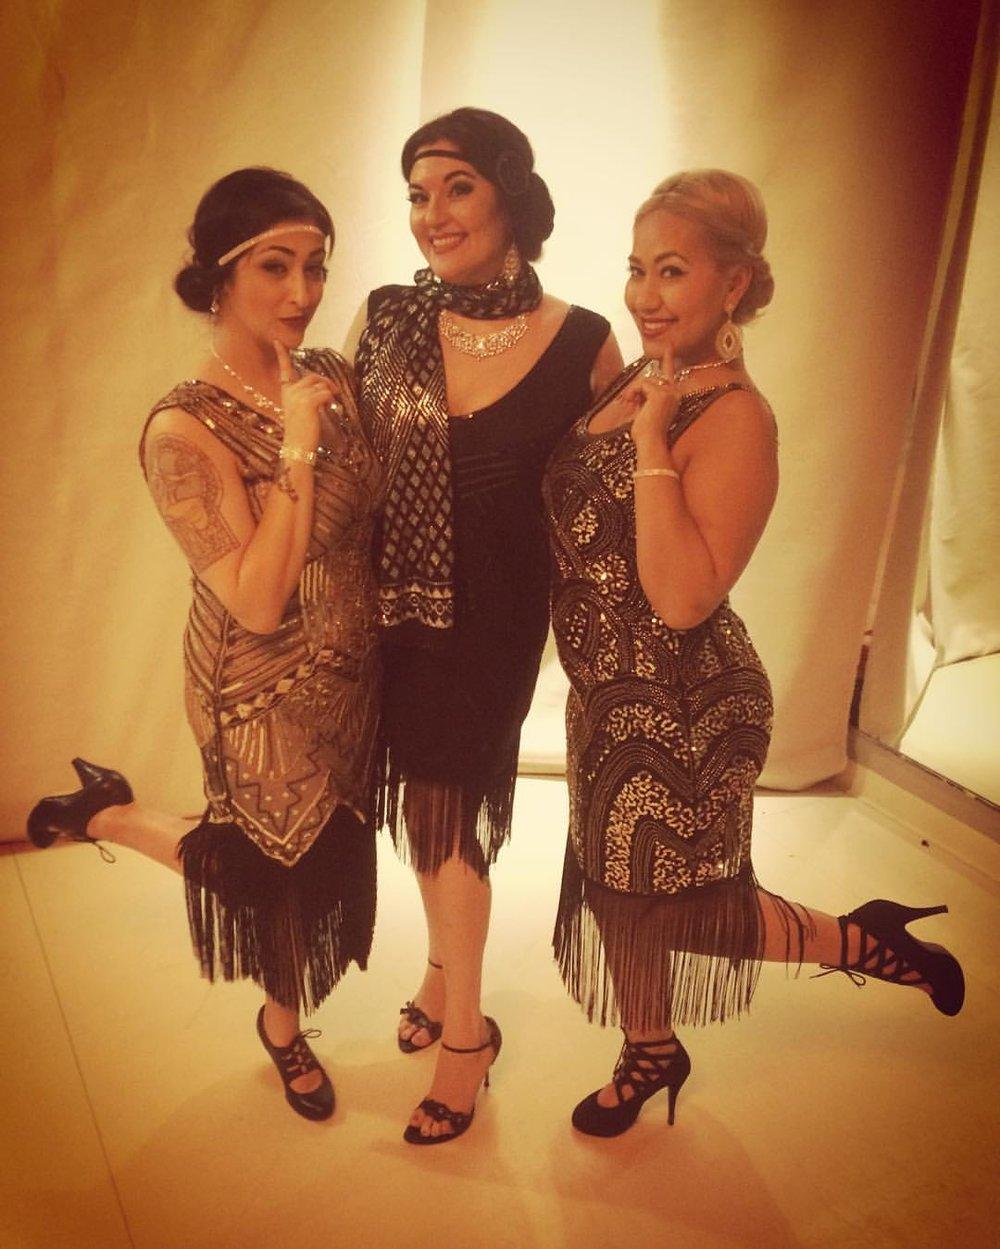 Our glamorous opening dancers~ Alia, Shana & Belen preshow